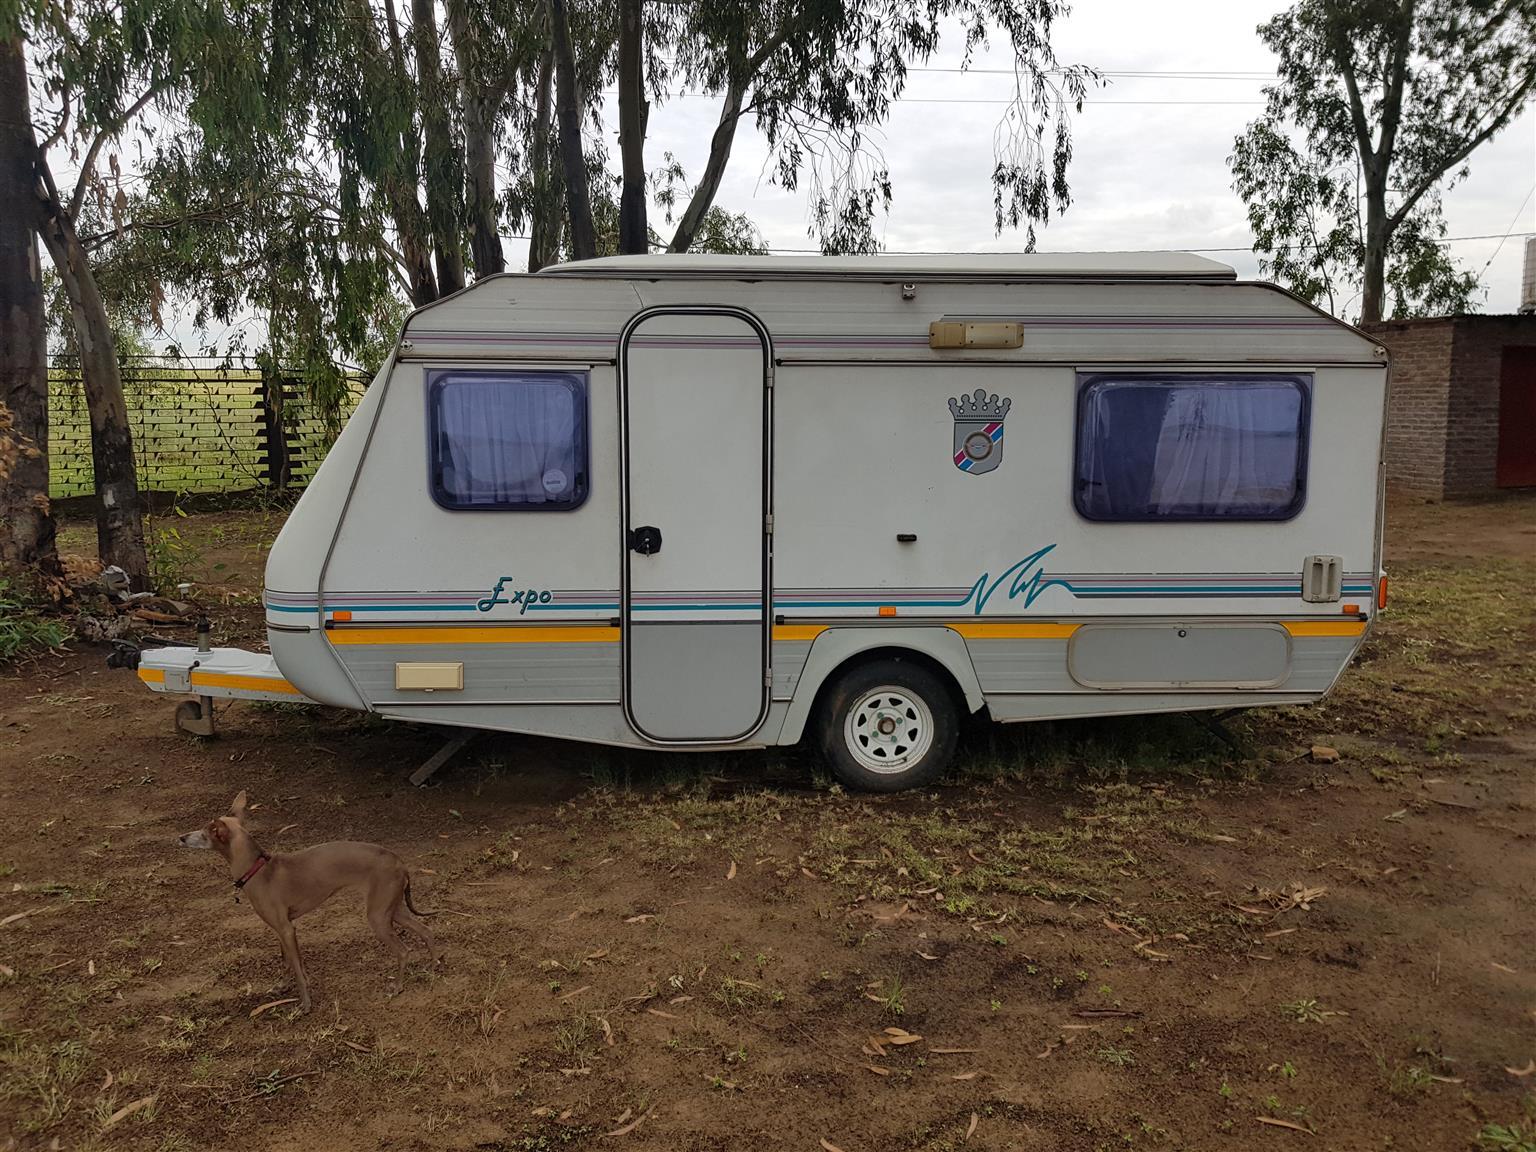 1997 Jurgens Expo Caravan (Full tent + Rally Tent)